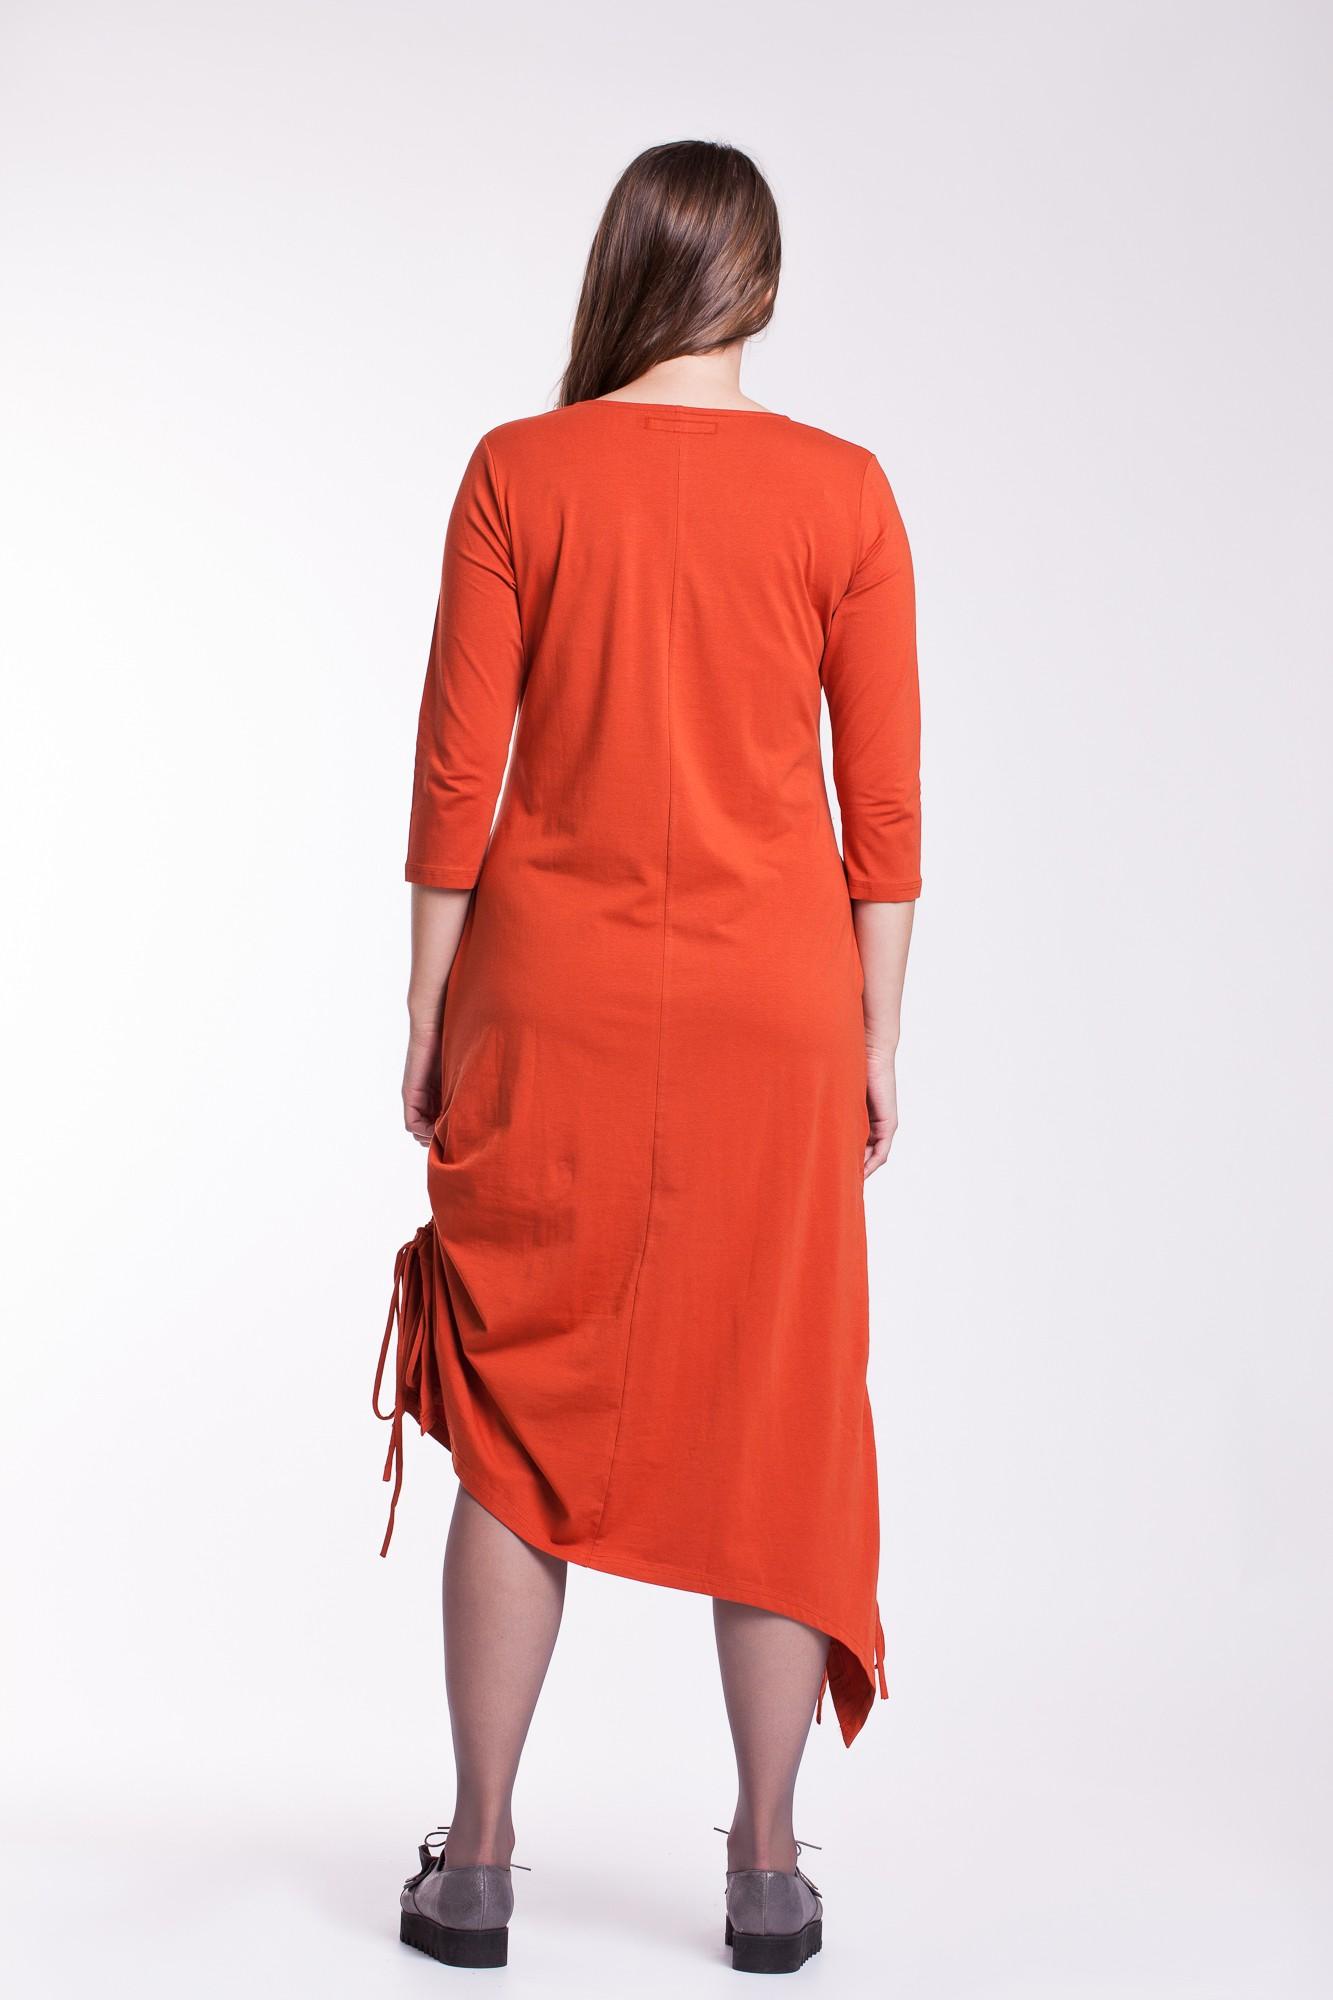 Rochie portocalie fronsata Ela cu aplicatie brodata - paun